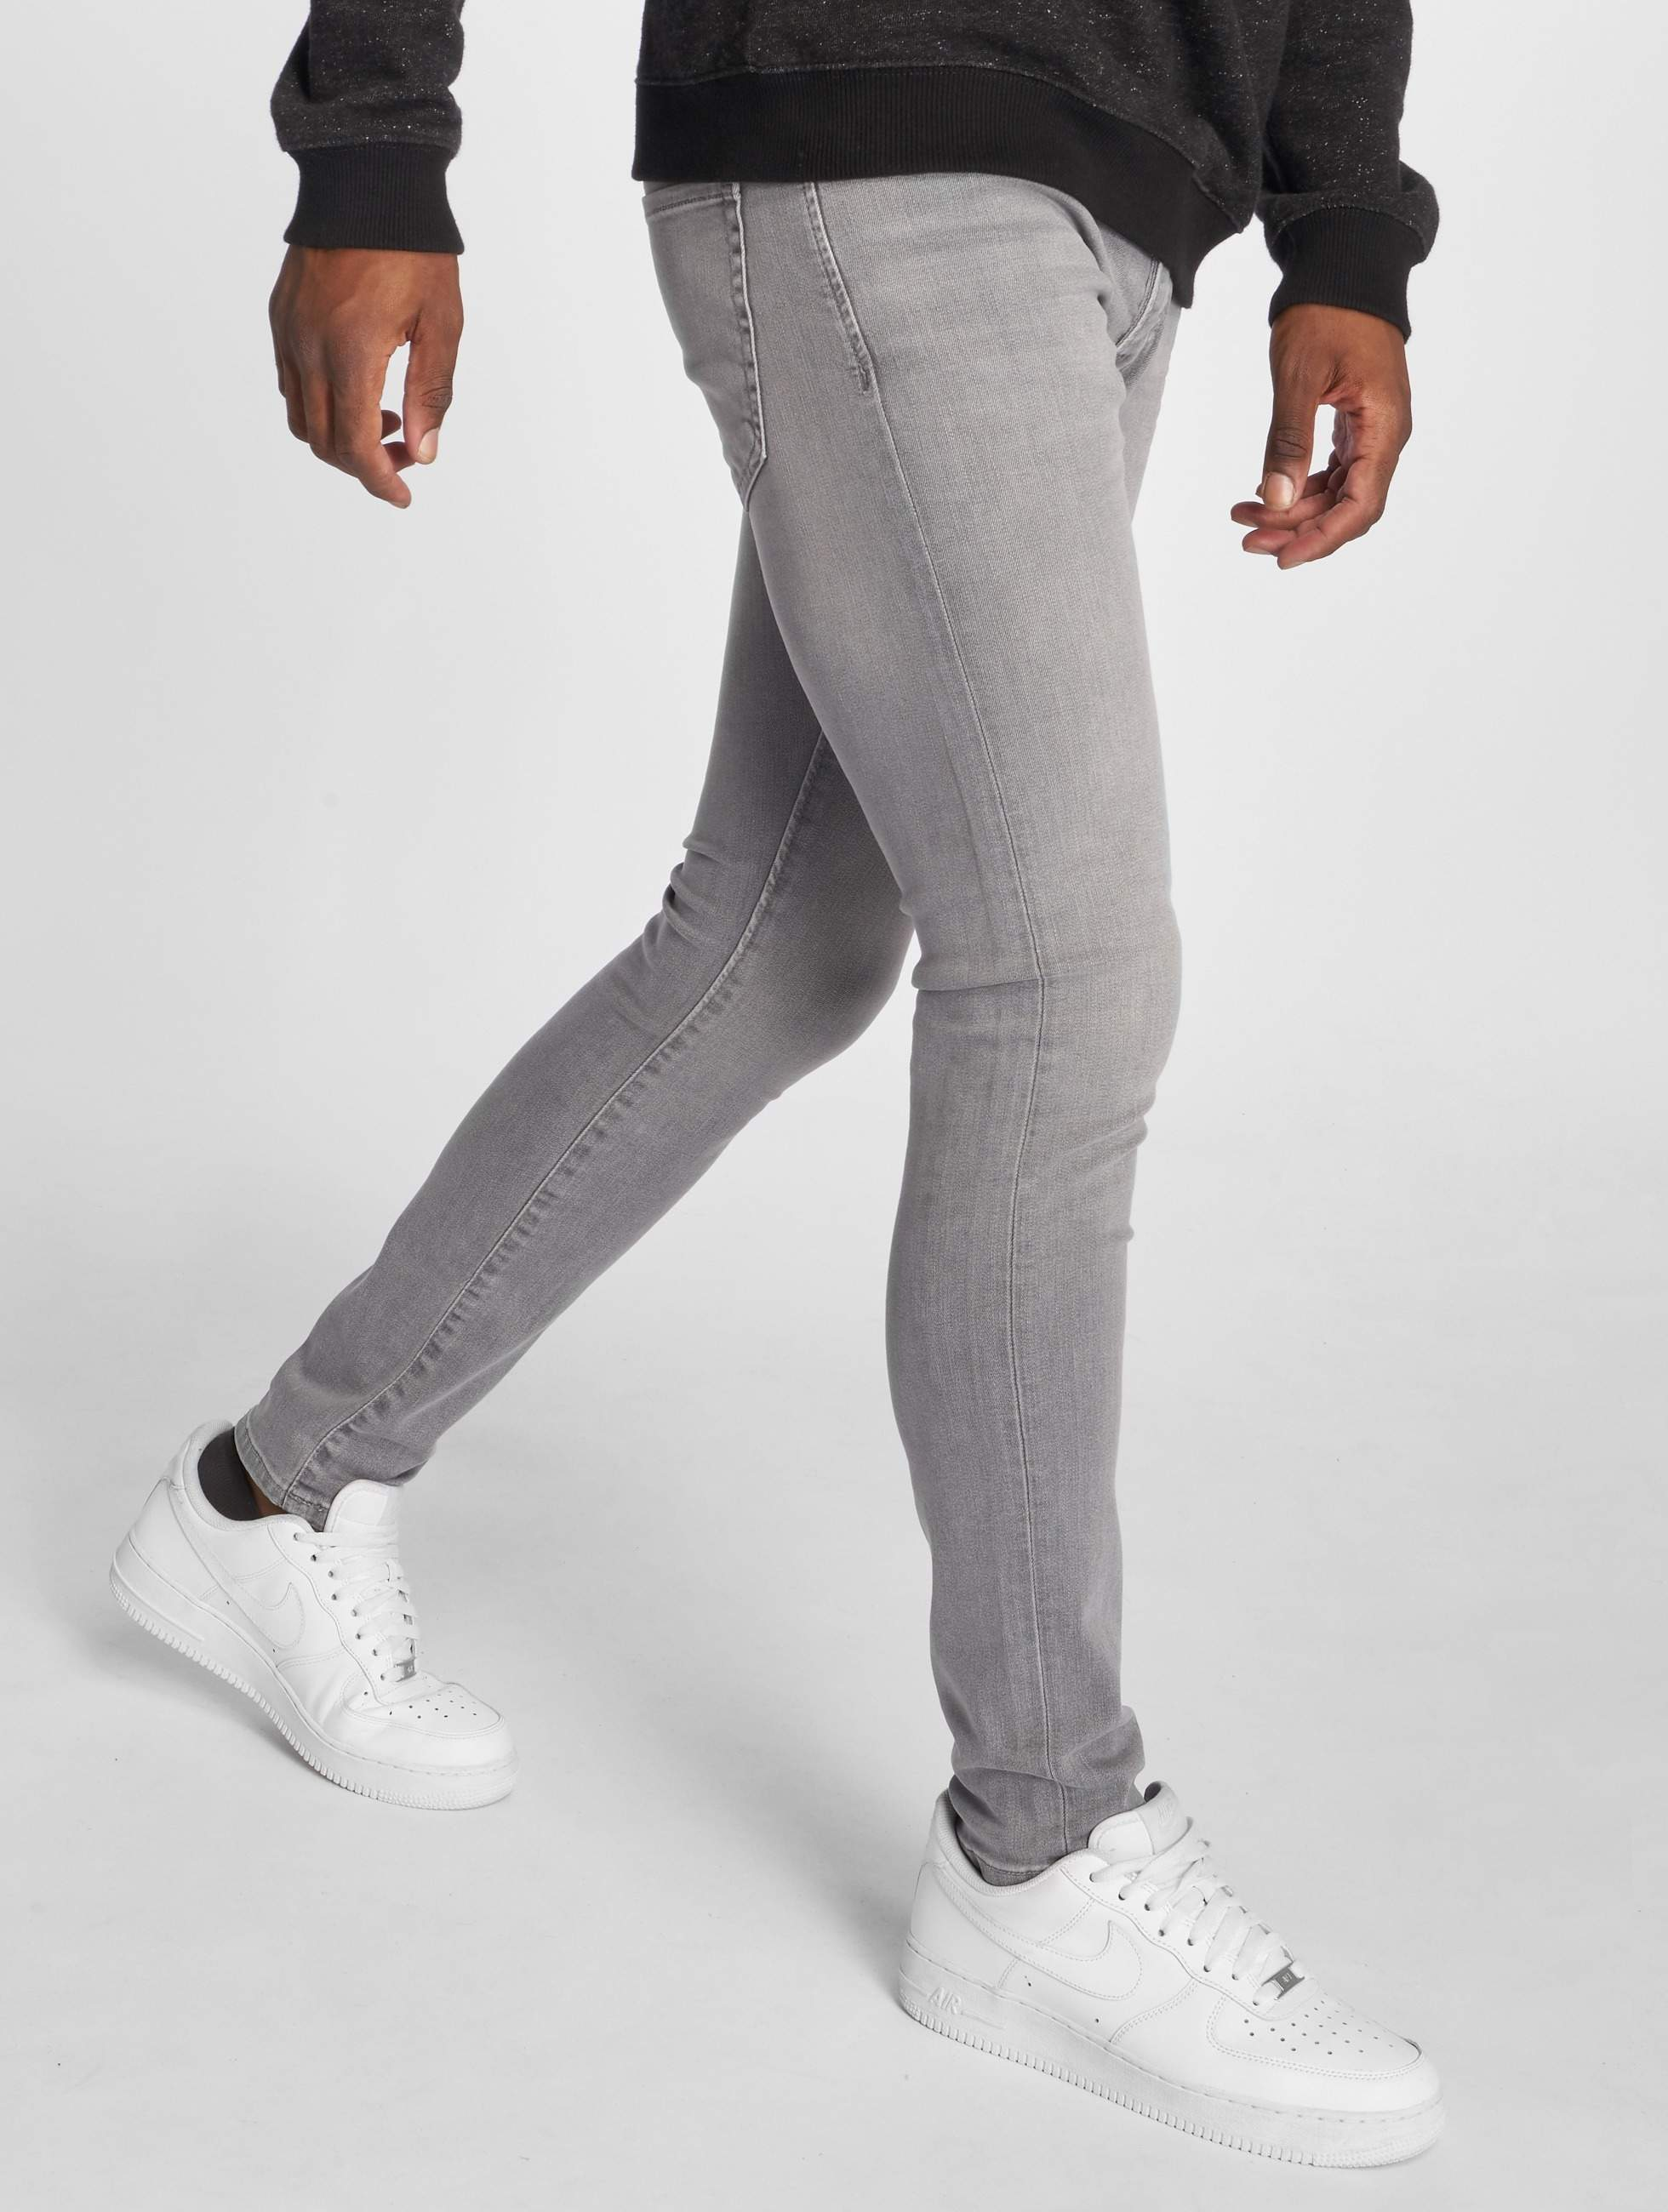 GRJ Denim | Basic gris Homme Jean slim